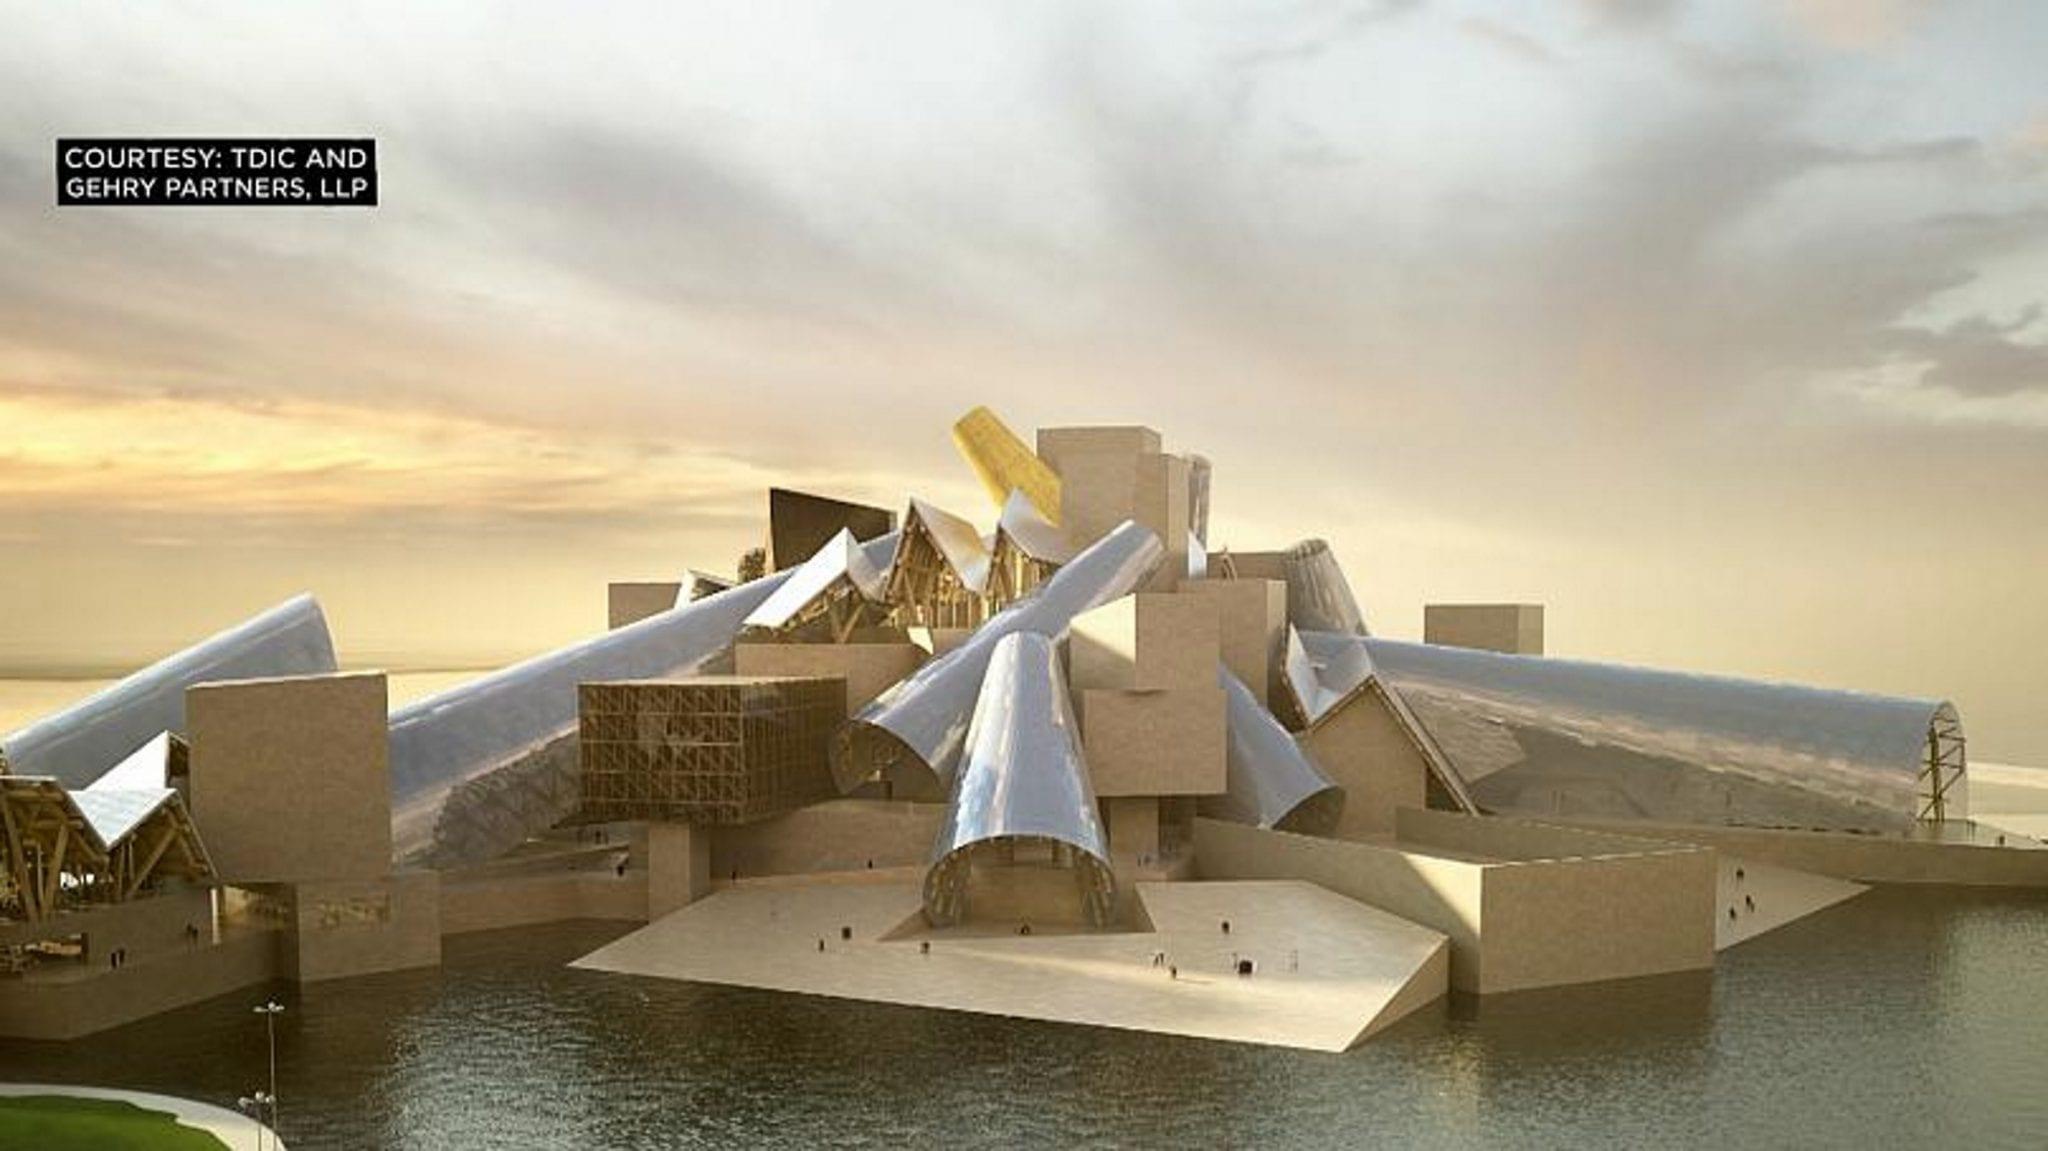 Il Guggenheim Museum Abu Dhabi? Aprirà nel 2022. Parola del direttore Richard Armstrong